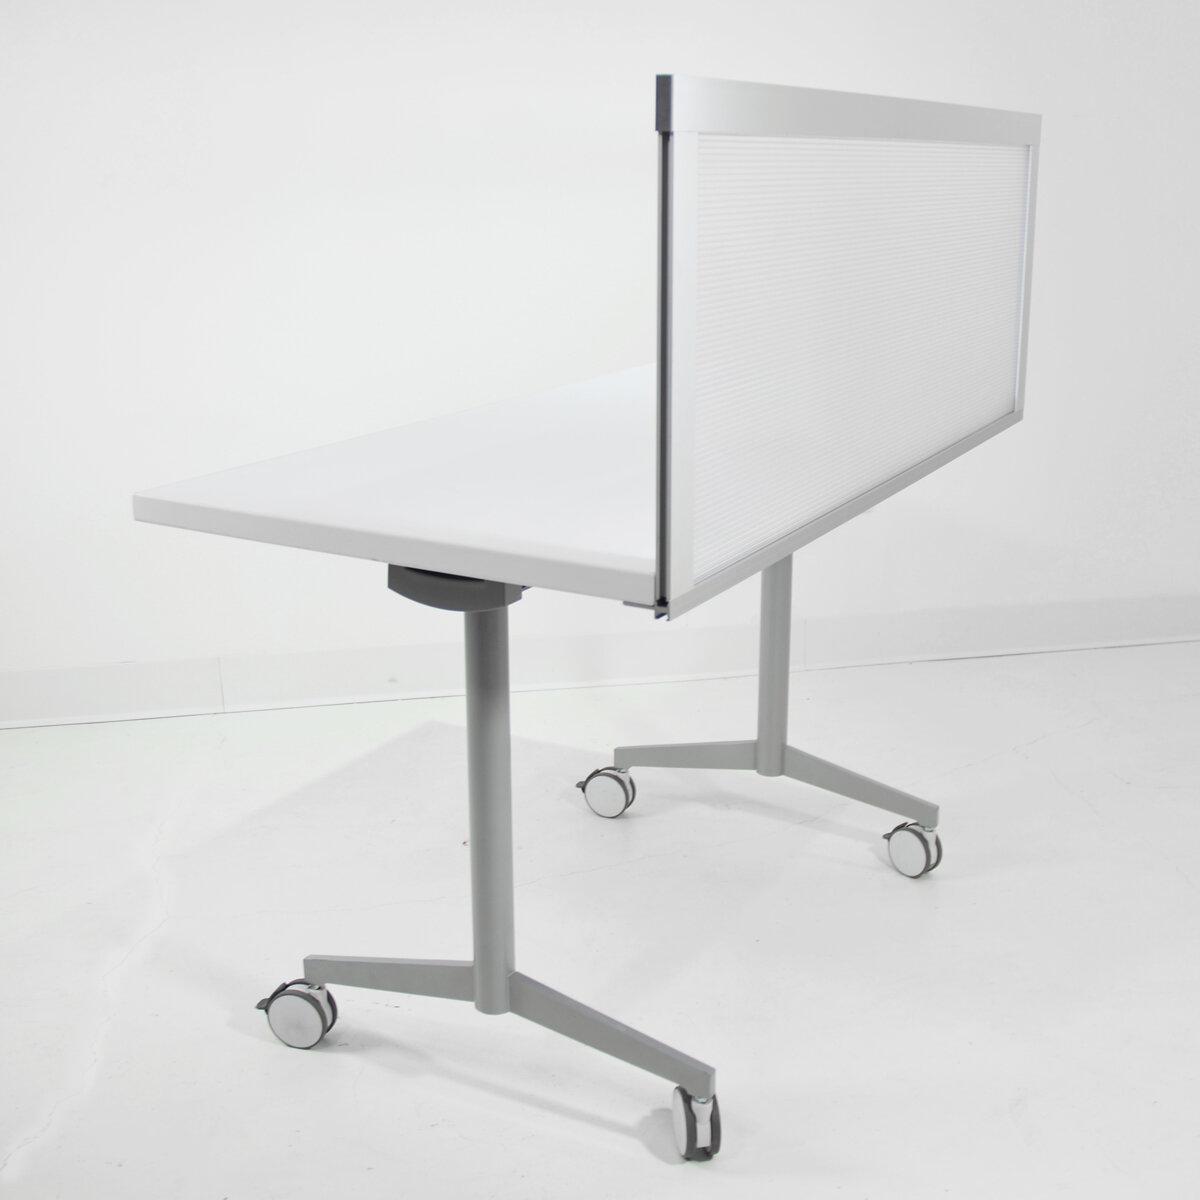 Etonnant LOFTwall 4u0027 Privacy Desk Divider   Wayfair